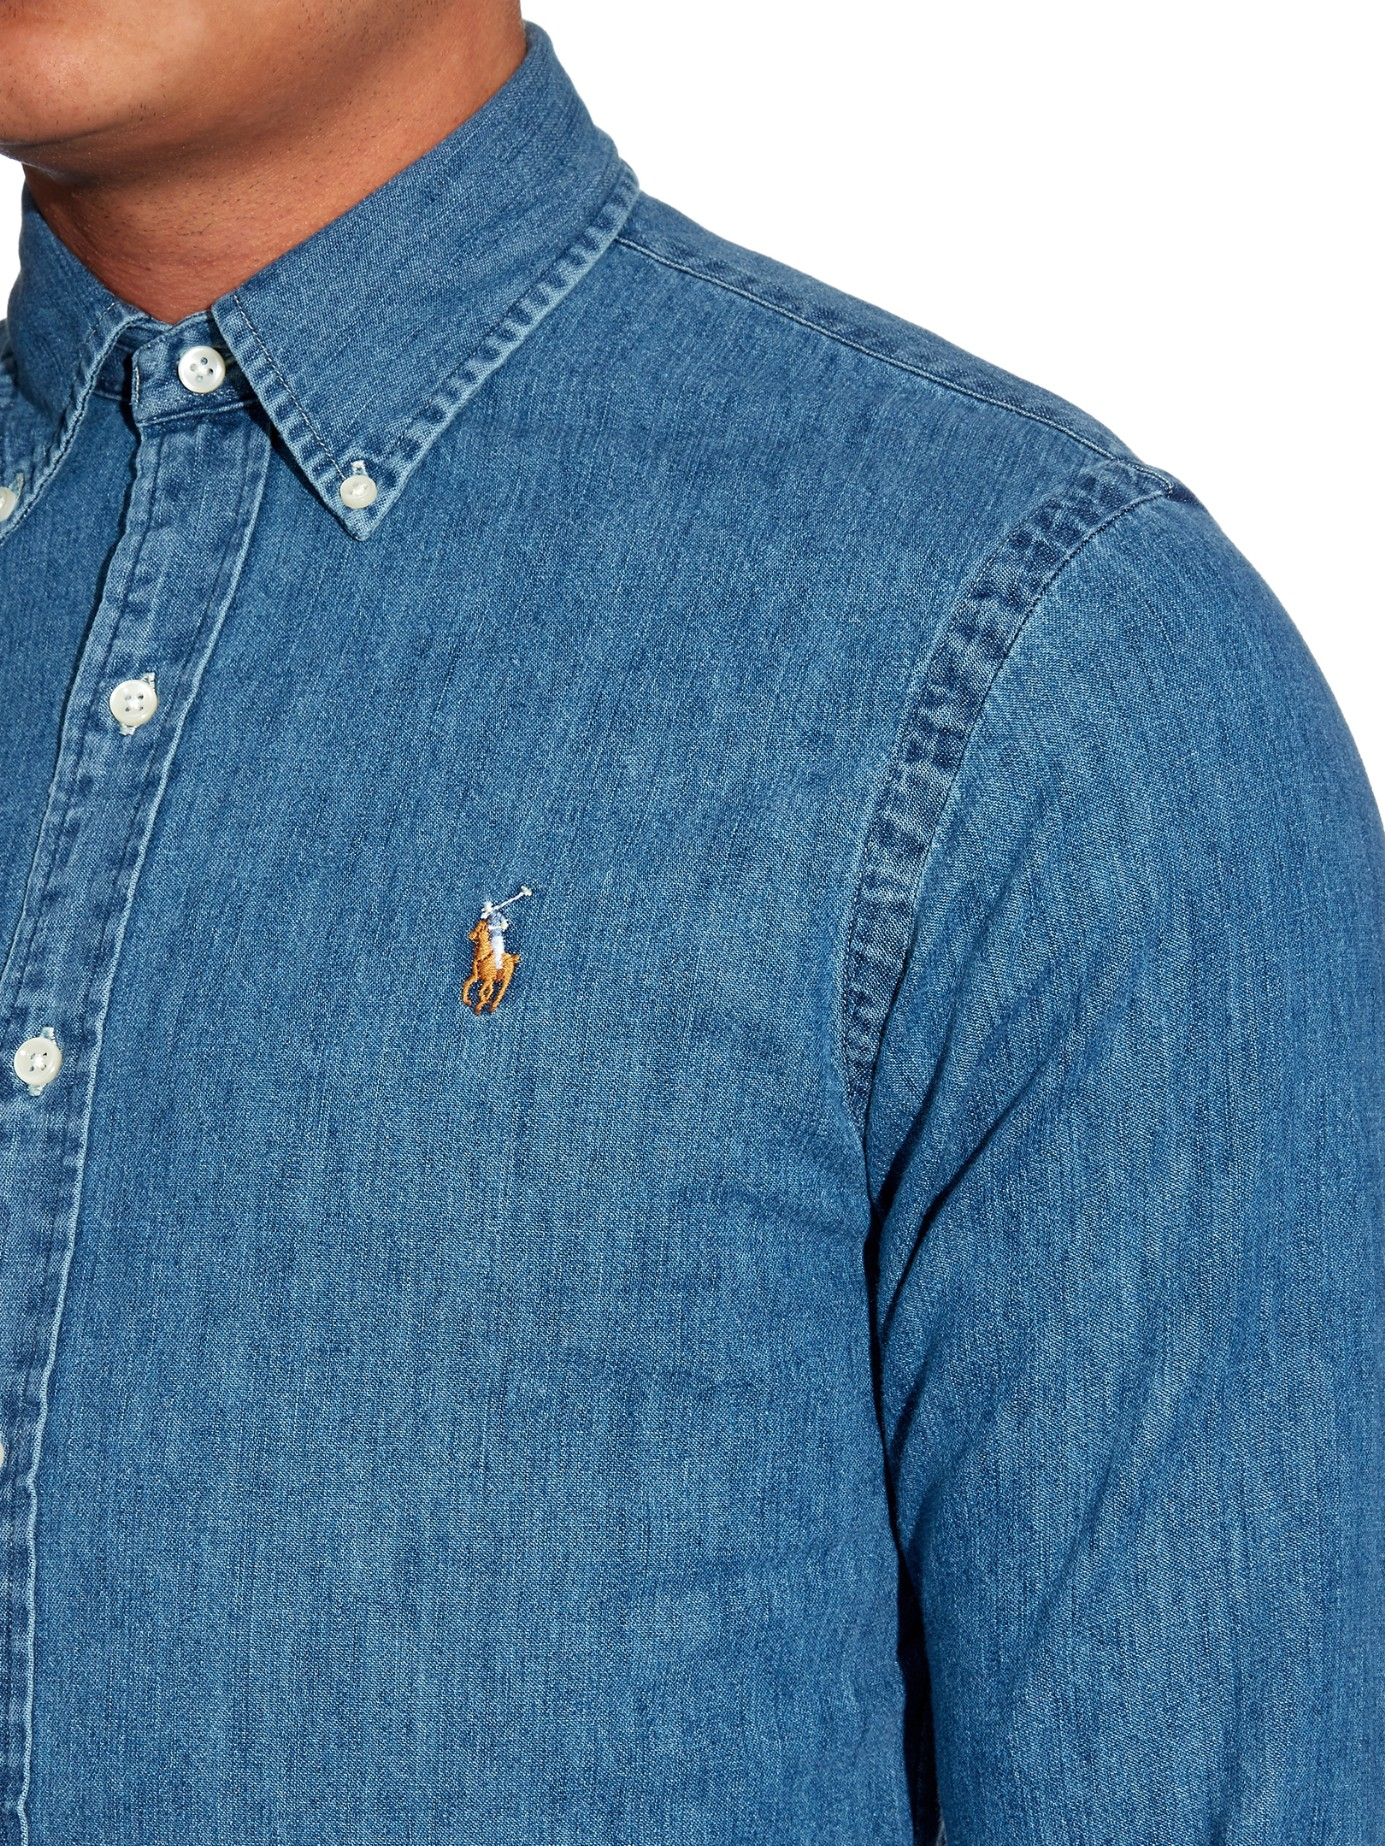 e667a444 ... italy polo ralph lauren chambray shirt slim fit f1c01 c56b5